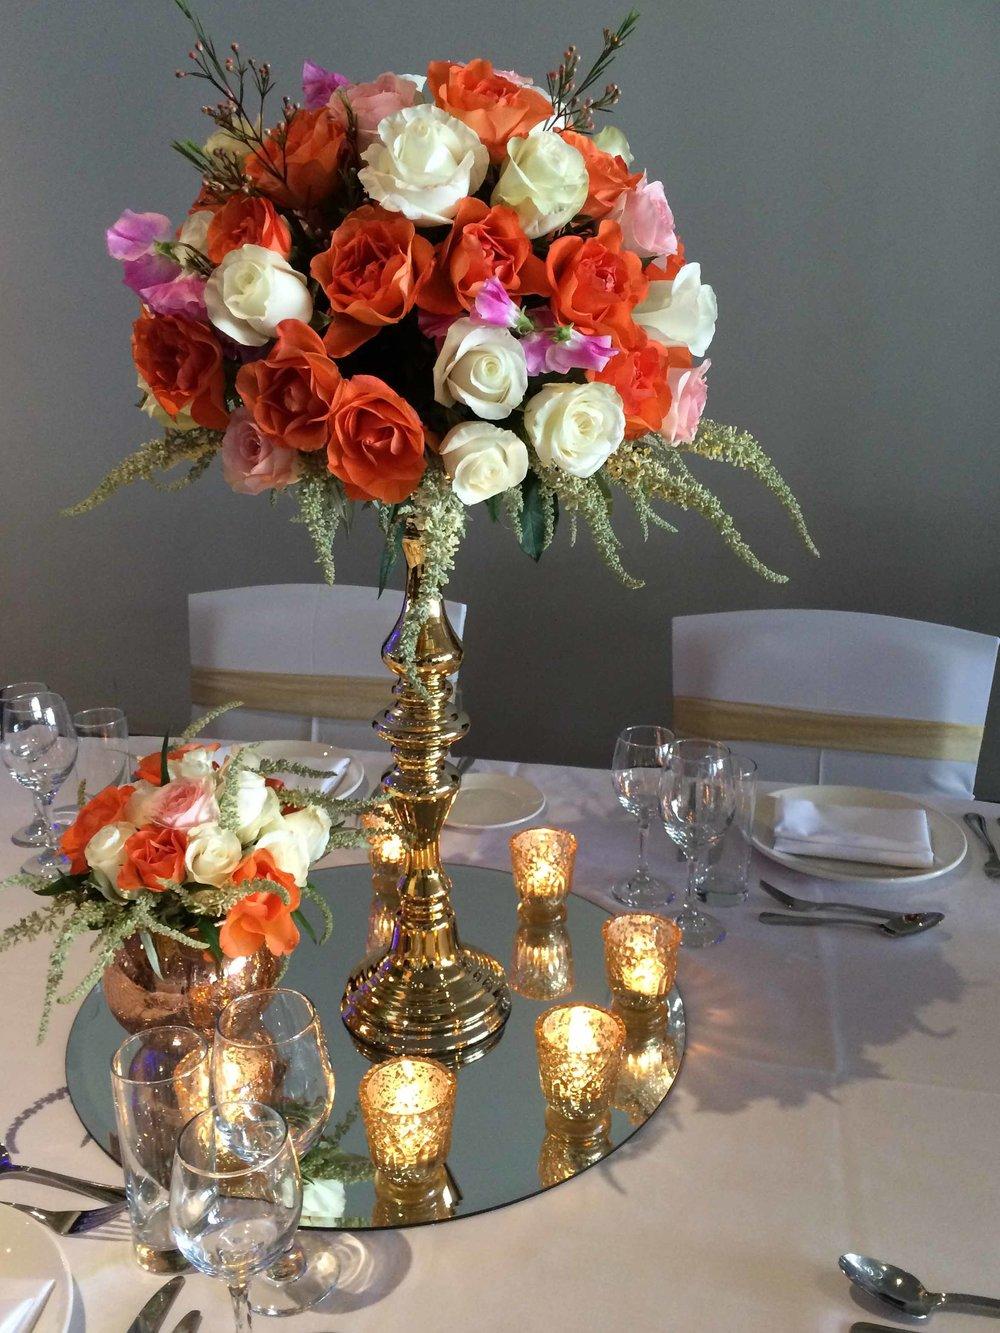 the-wedding-decorator-wedding-event-styling-sydney-northern-beaches19.jpg